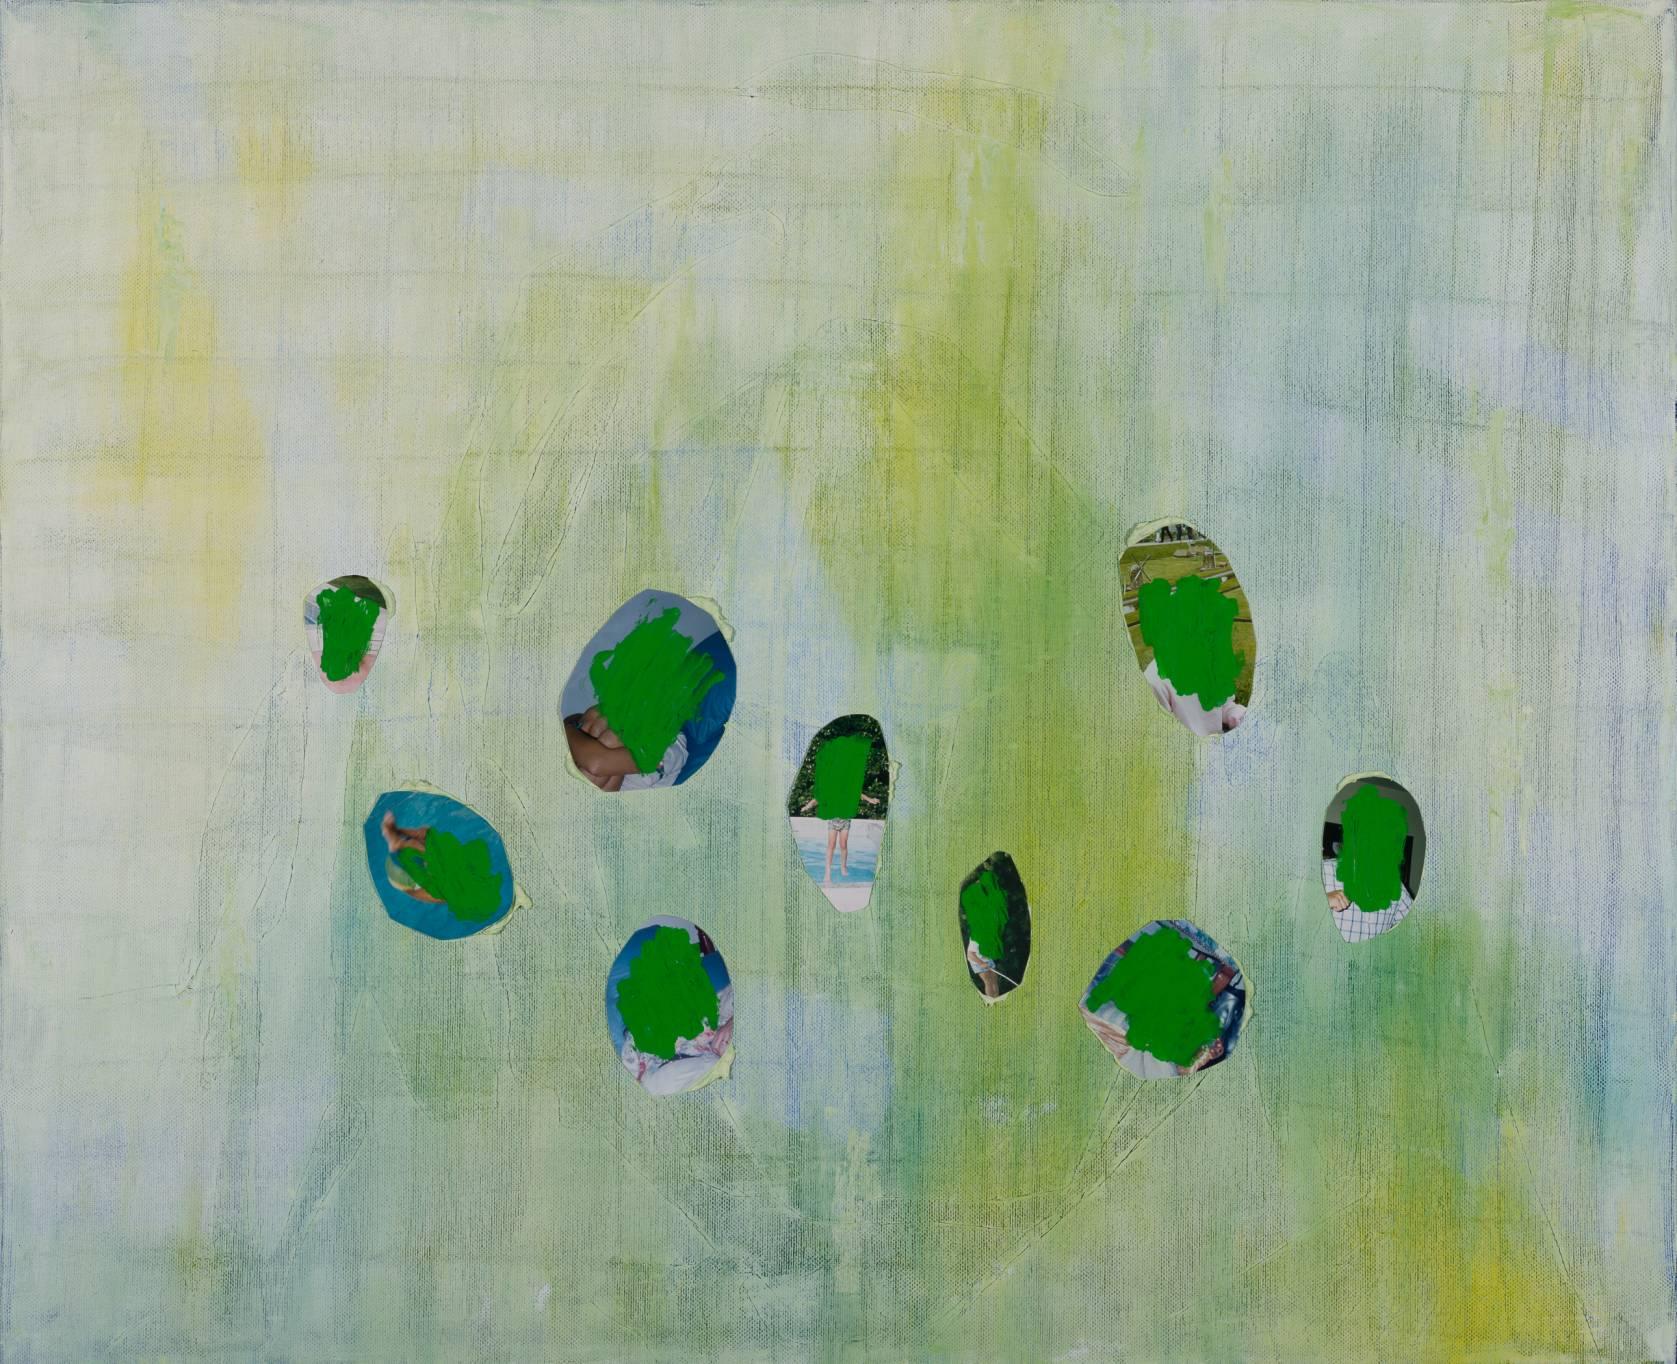 Bleu (When History Obsesses) (2015) - by Ohne Titel (Florence Drake Del Castillo)